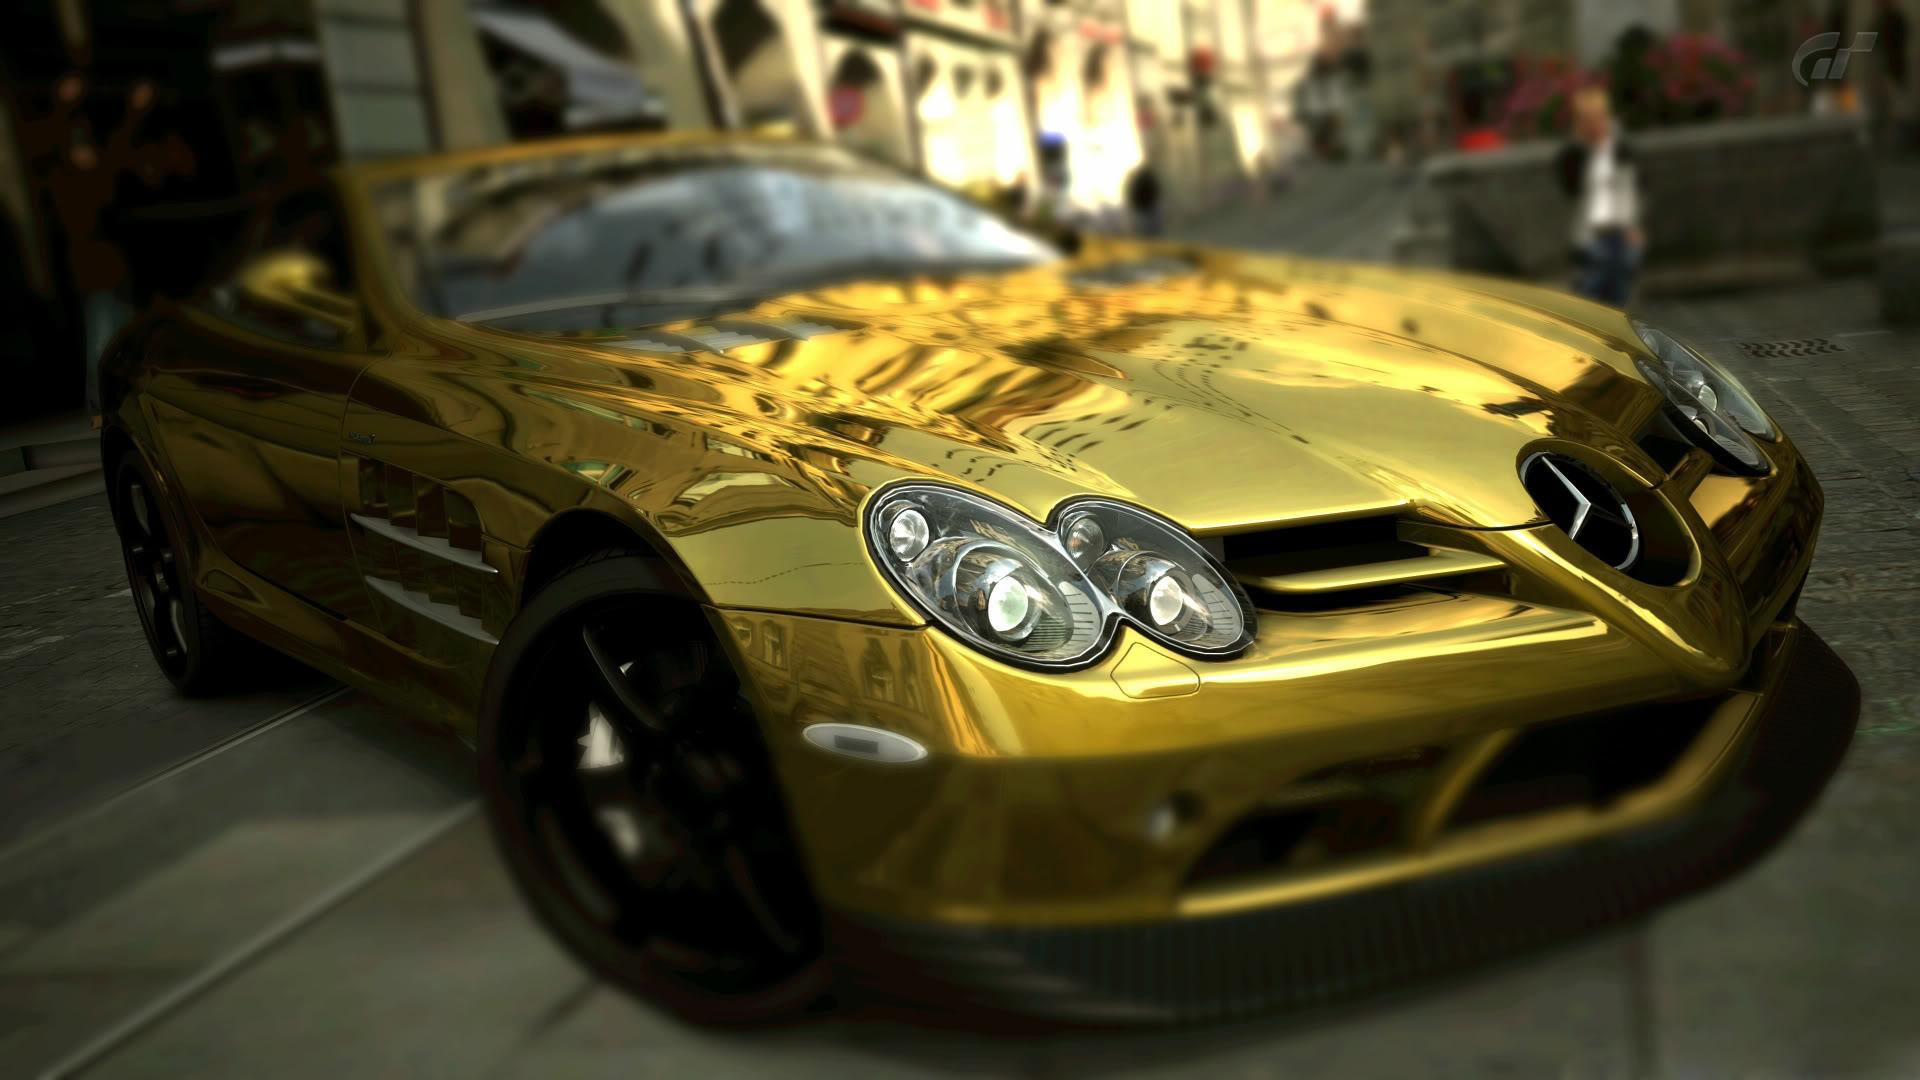 Cool Gold Cars Wallpapers Pc Mercedes Benz Slr Mclaren